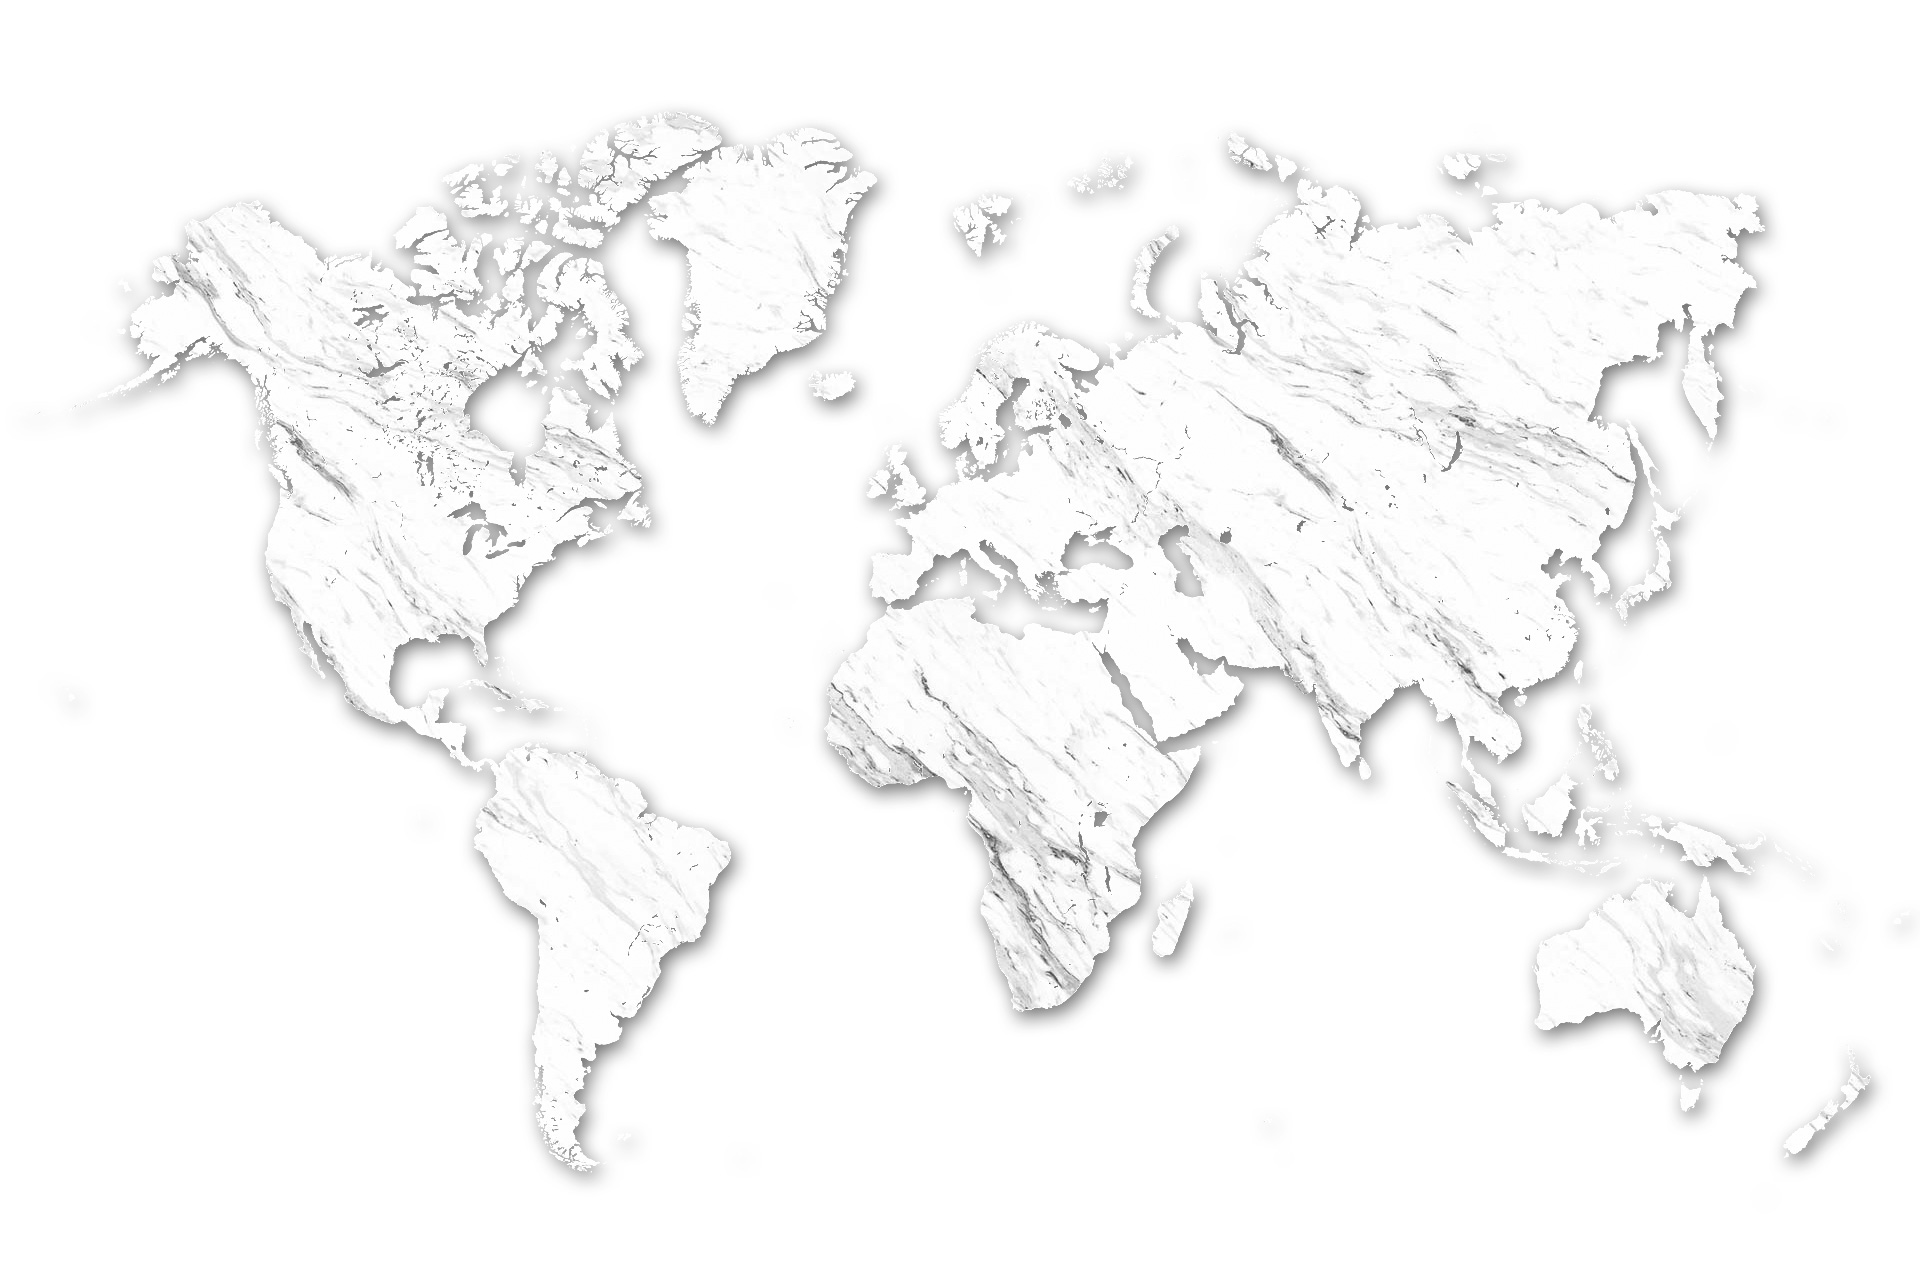 world-map-marble.jpg